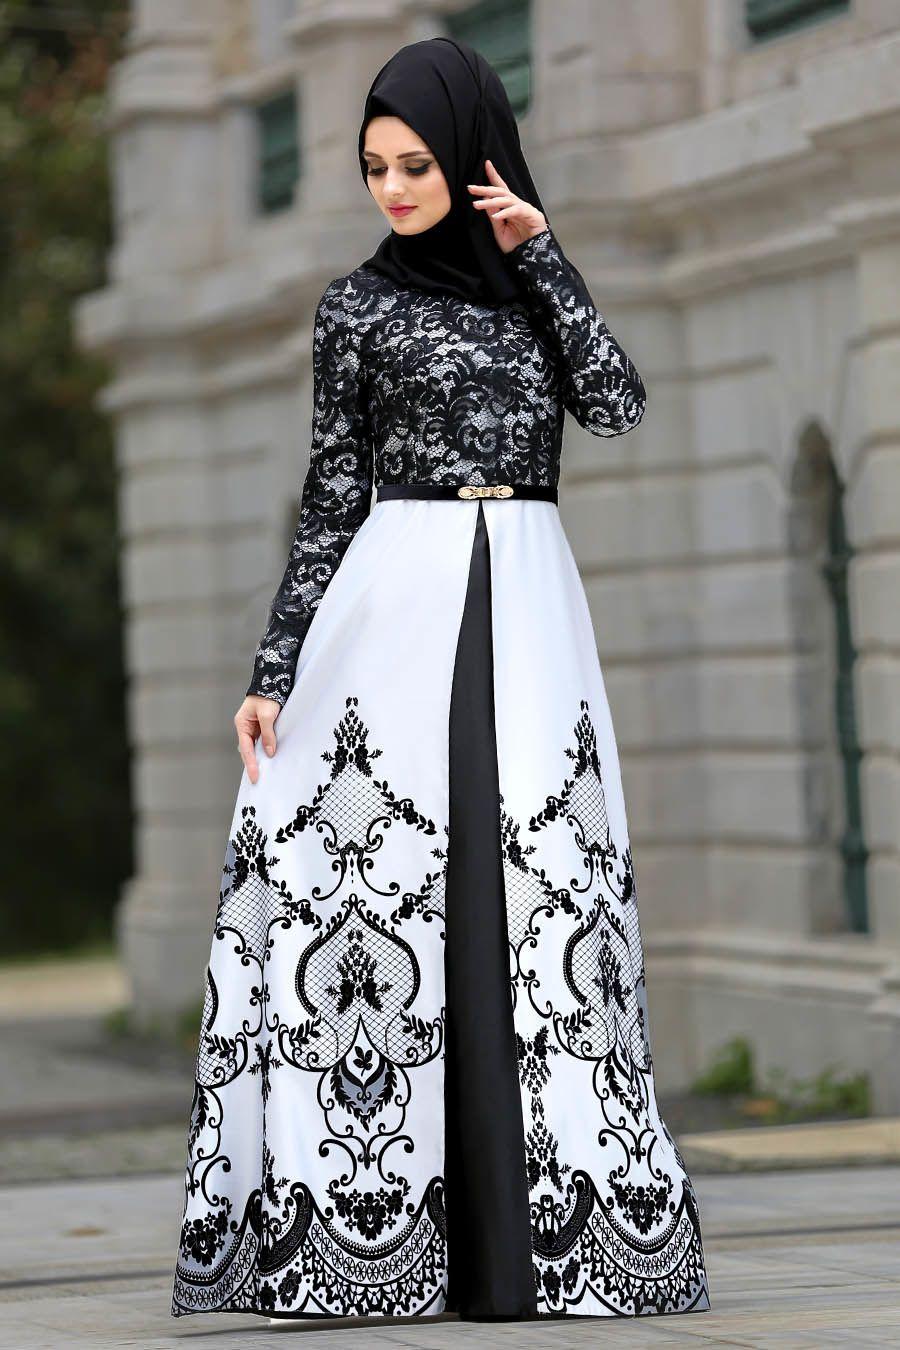 Tesetturlu Abiye Elbise Flok Baskili Gri Tesettur Abiye Elbise 2952gr Tesetturisland Tesettur Tesetturelbise T Busana Islami Gaya Abaya Model Baju Wanita